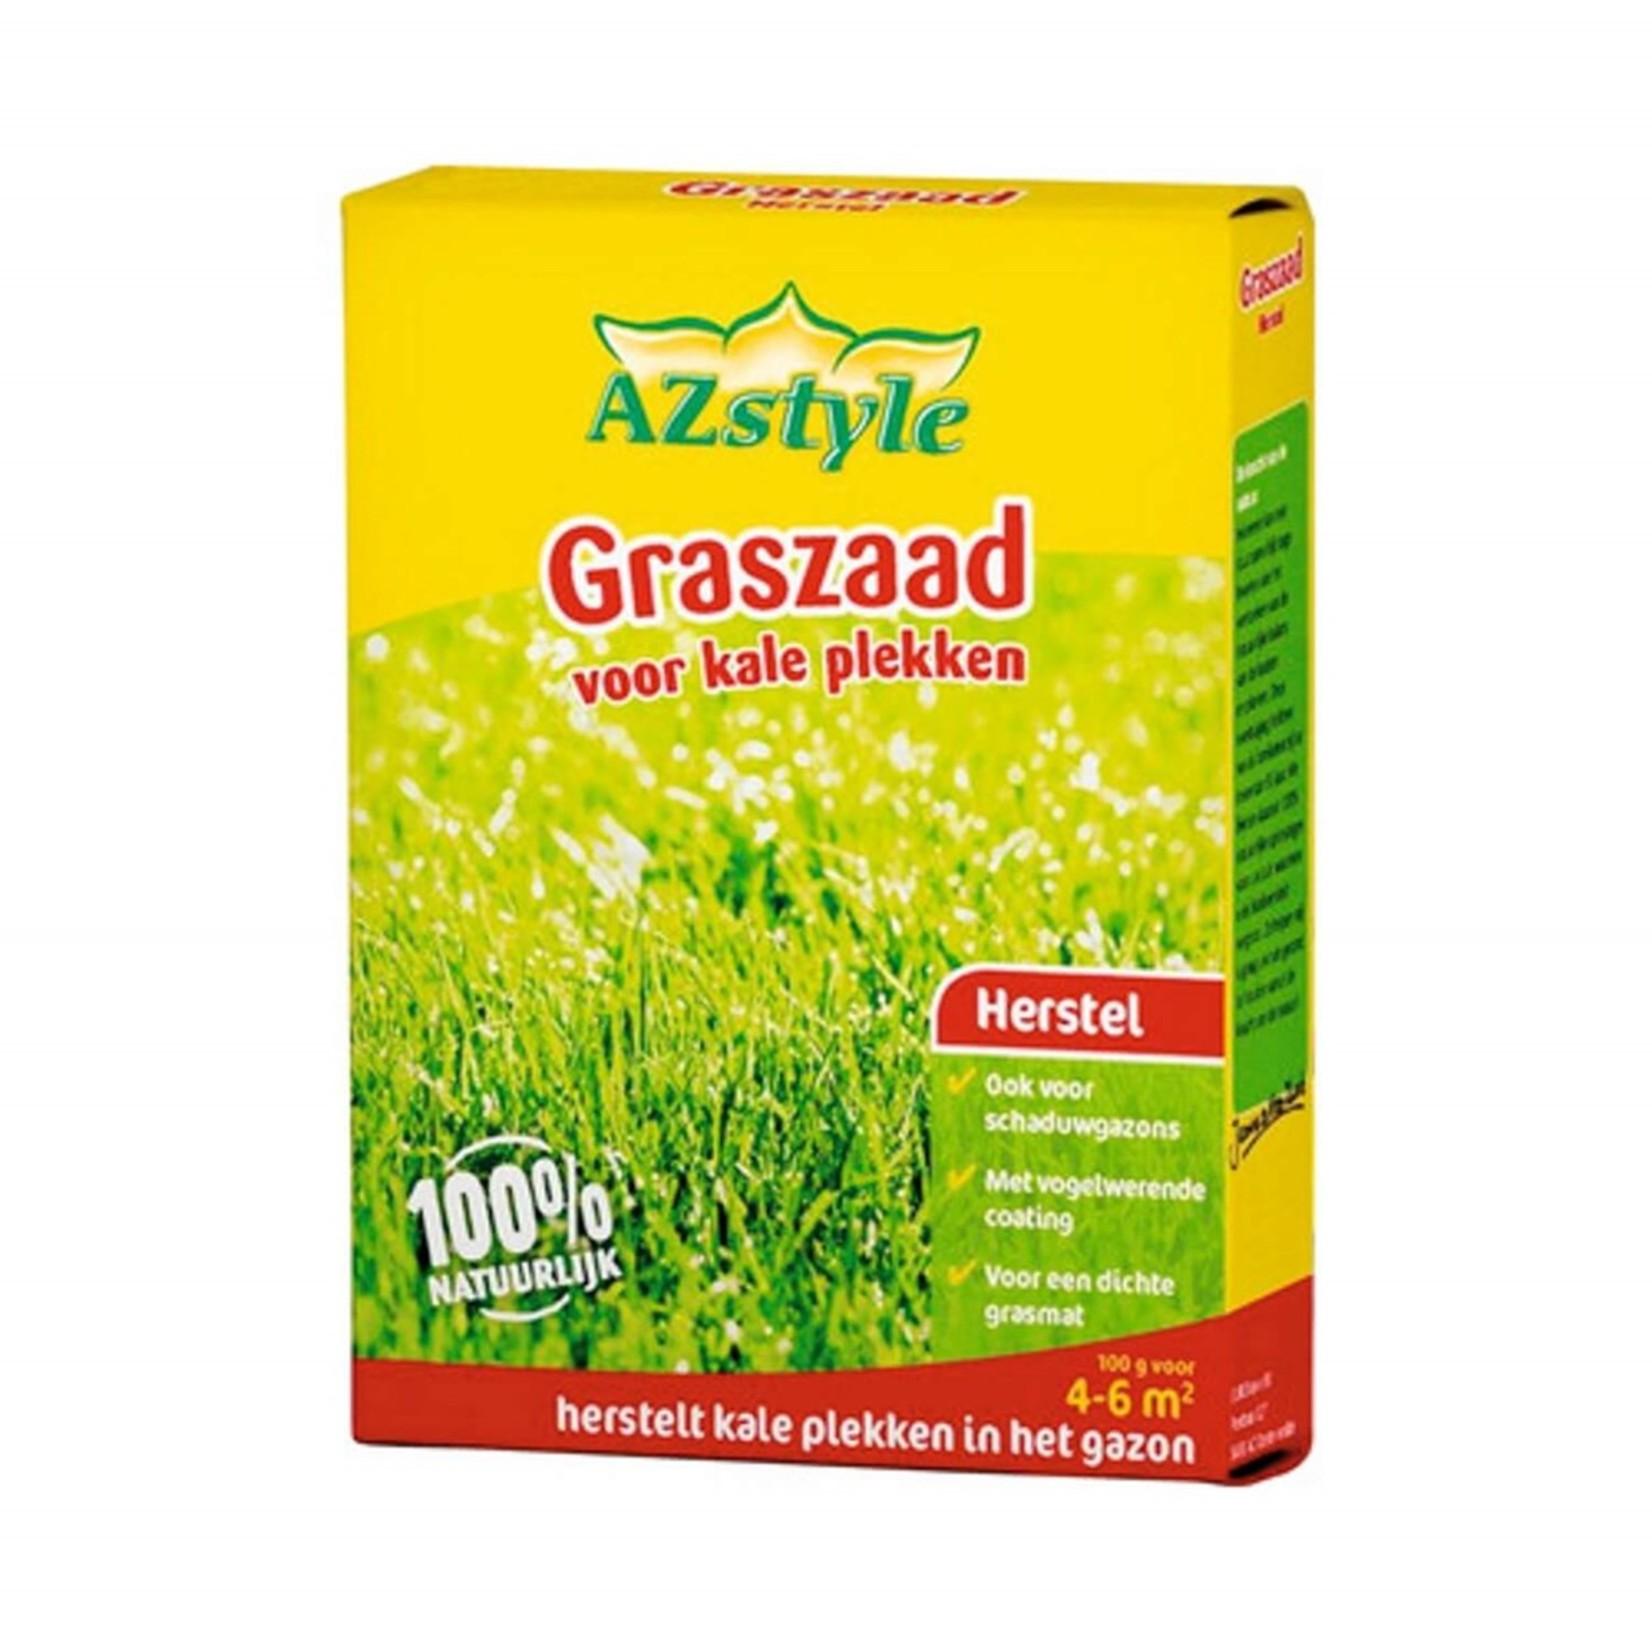 Ecostyle ECOSTYLE Graszaad herstel 100 g